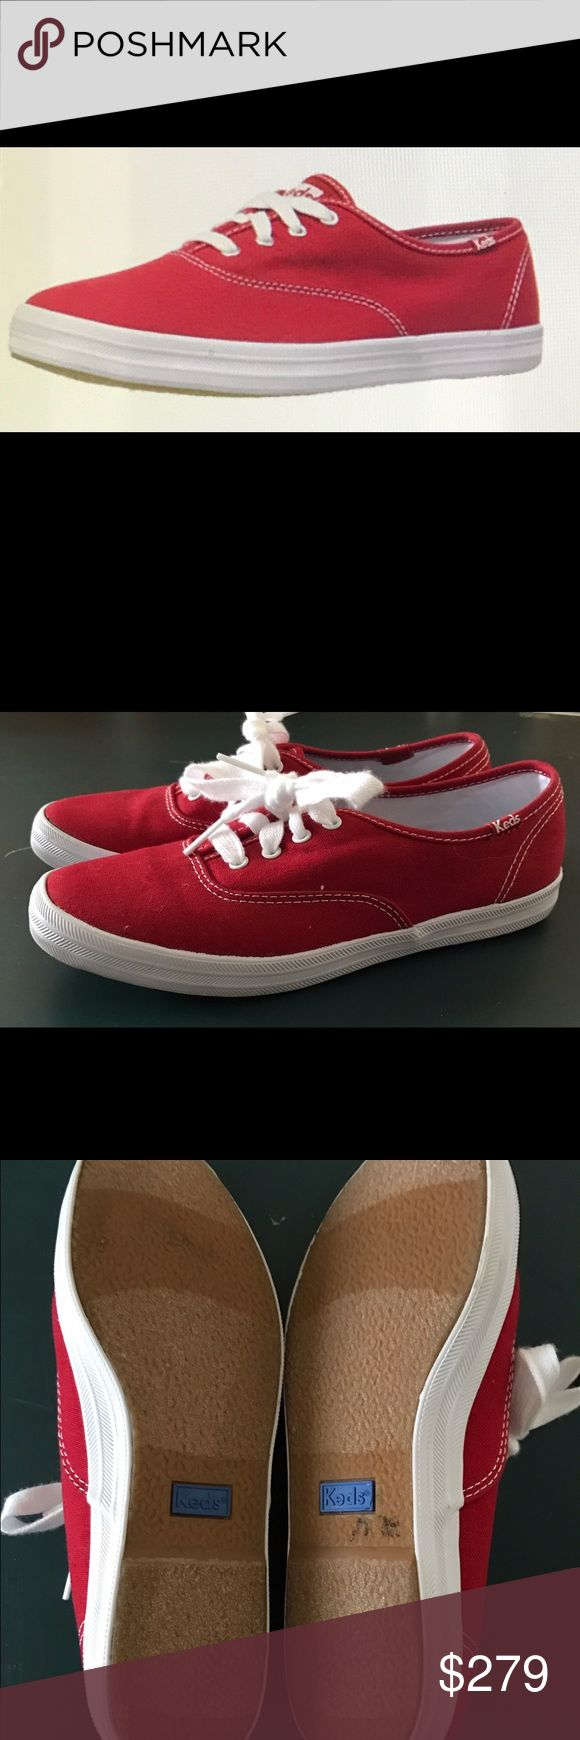 Selling this KEDS Champion Original Red Canvas Sneaker (Size 5) on Poshmark! My username is: tgmcallister. #shopmycloset #poshmark #fashion #shopping #style #forsale #Keds #Shoes